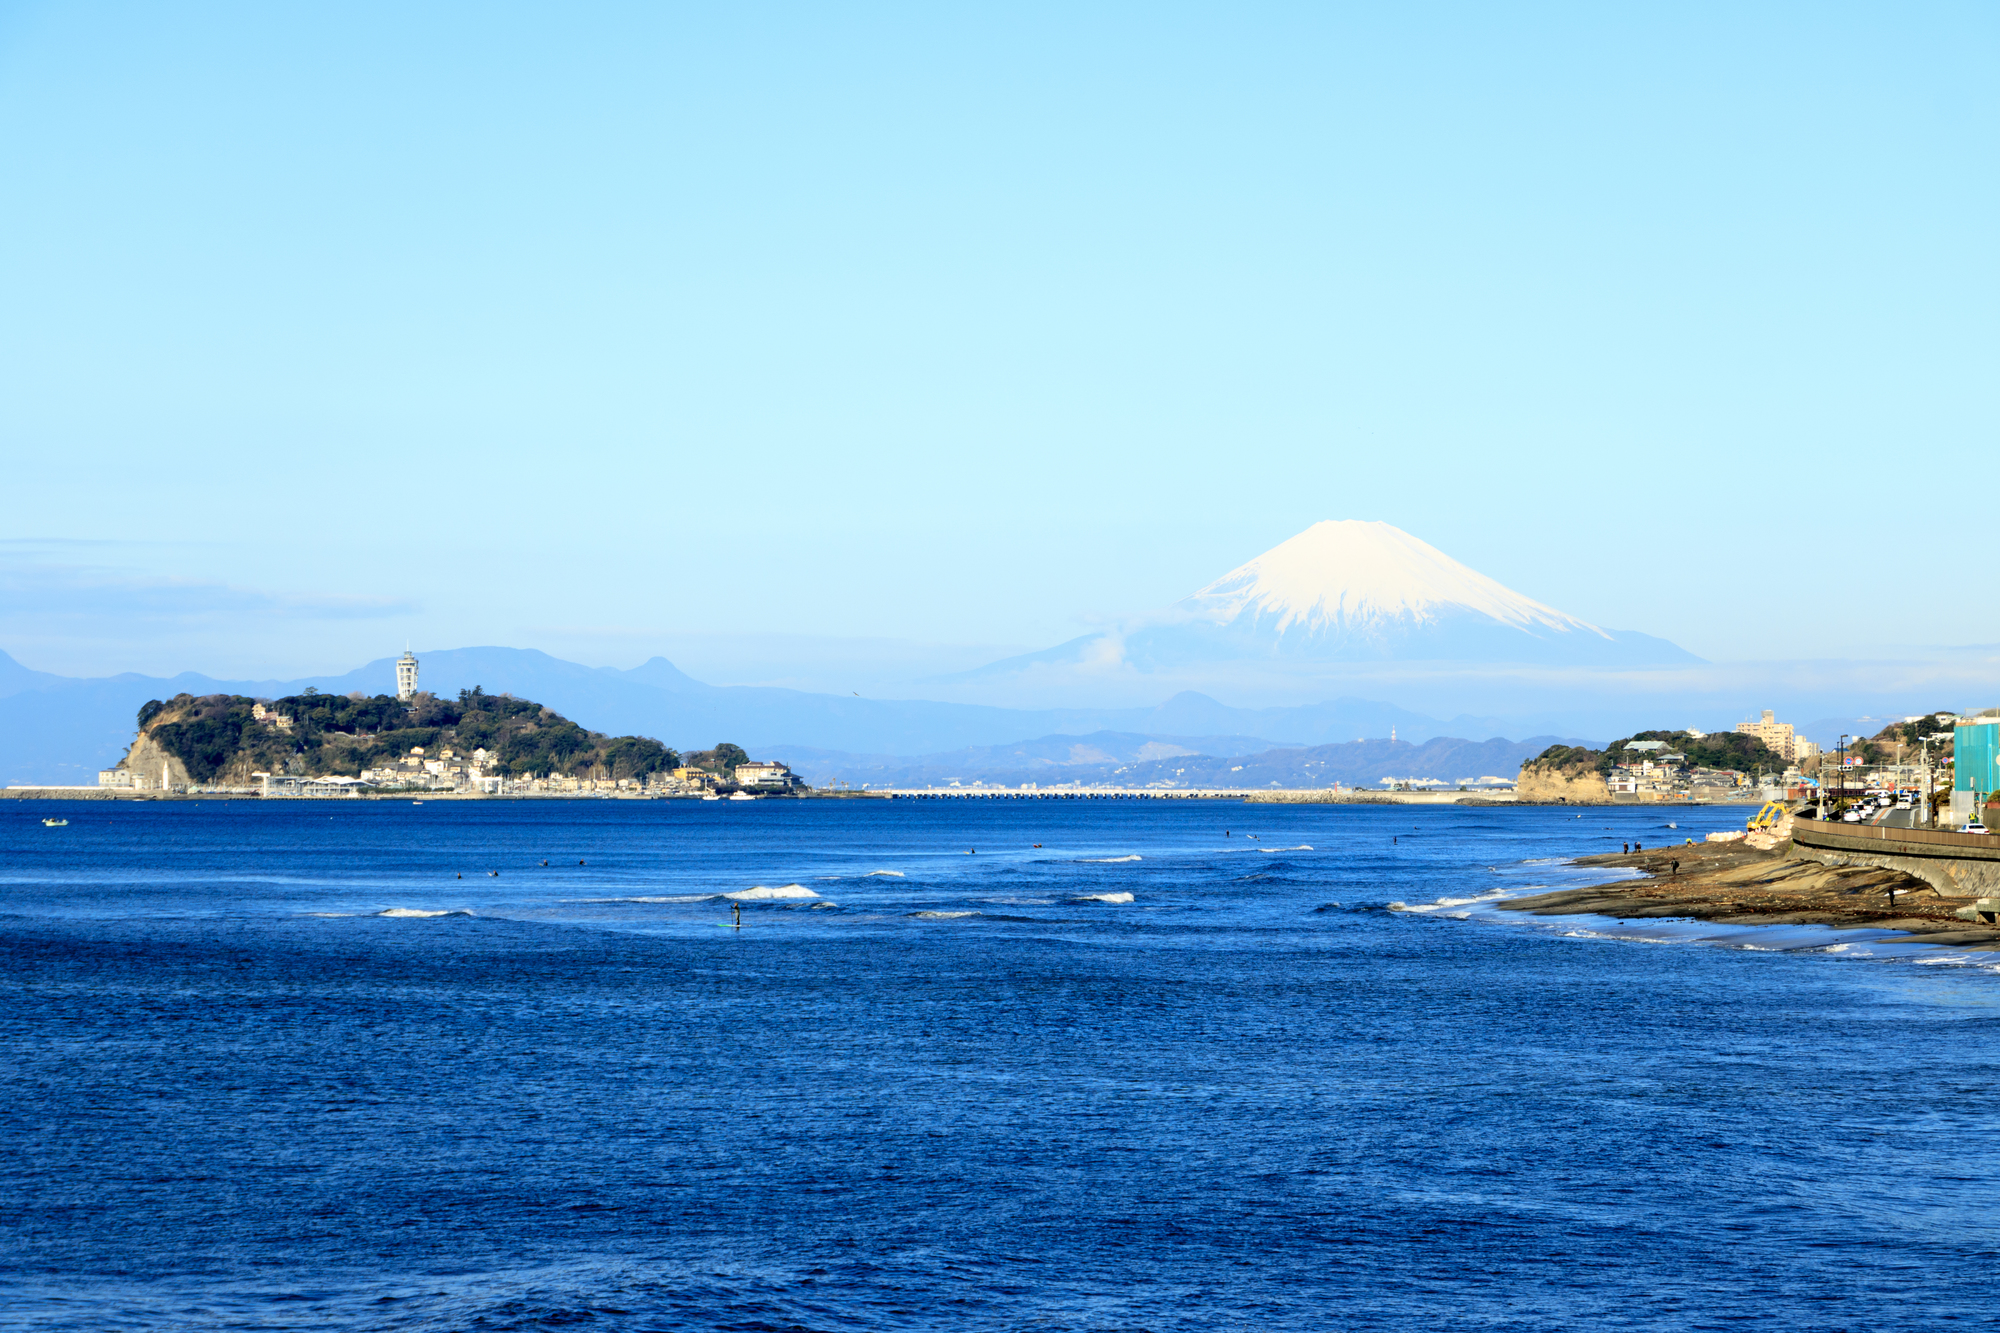 七里ヶ浜の景観(神奈川県/鎌倉市)